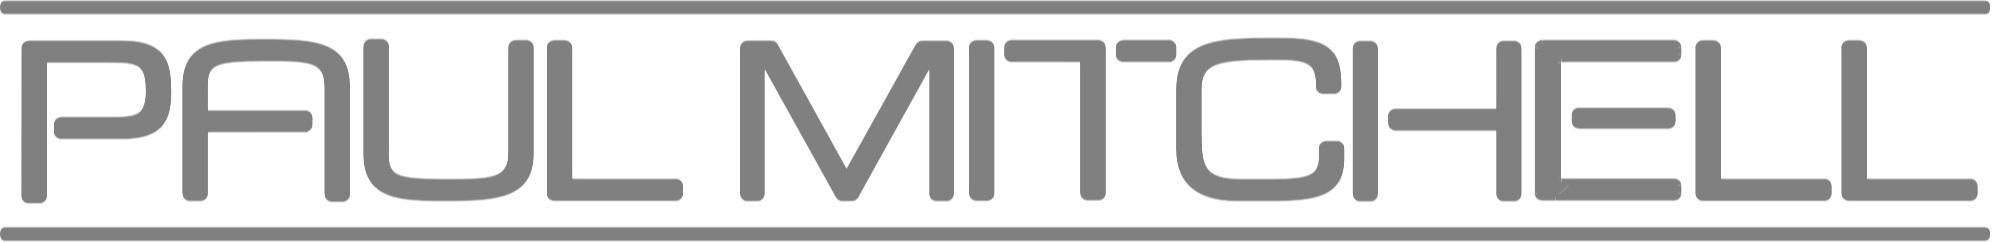 John-Paul-Mitchell-Systems-Logo.png